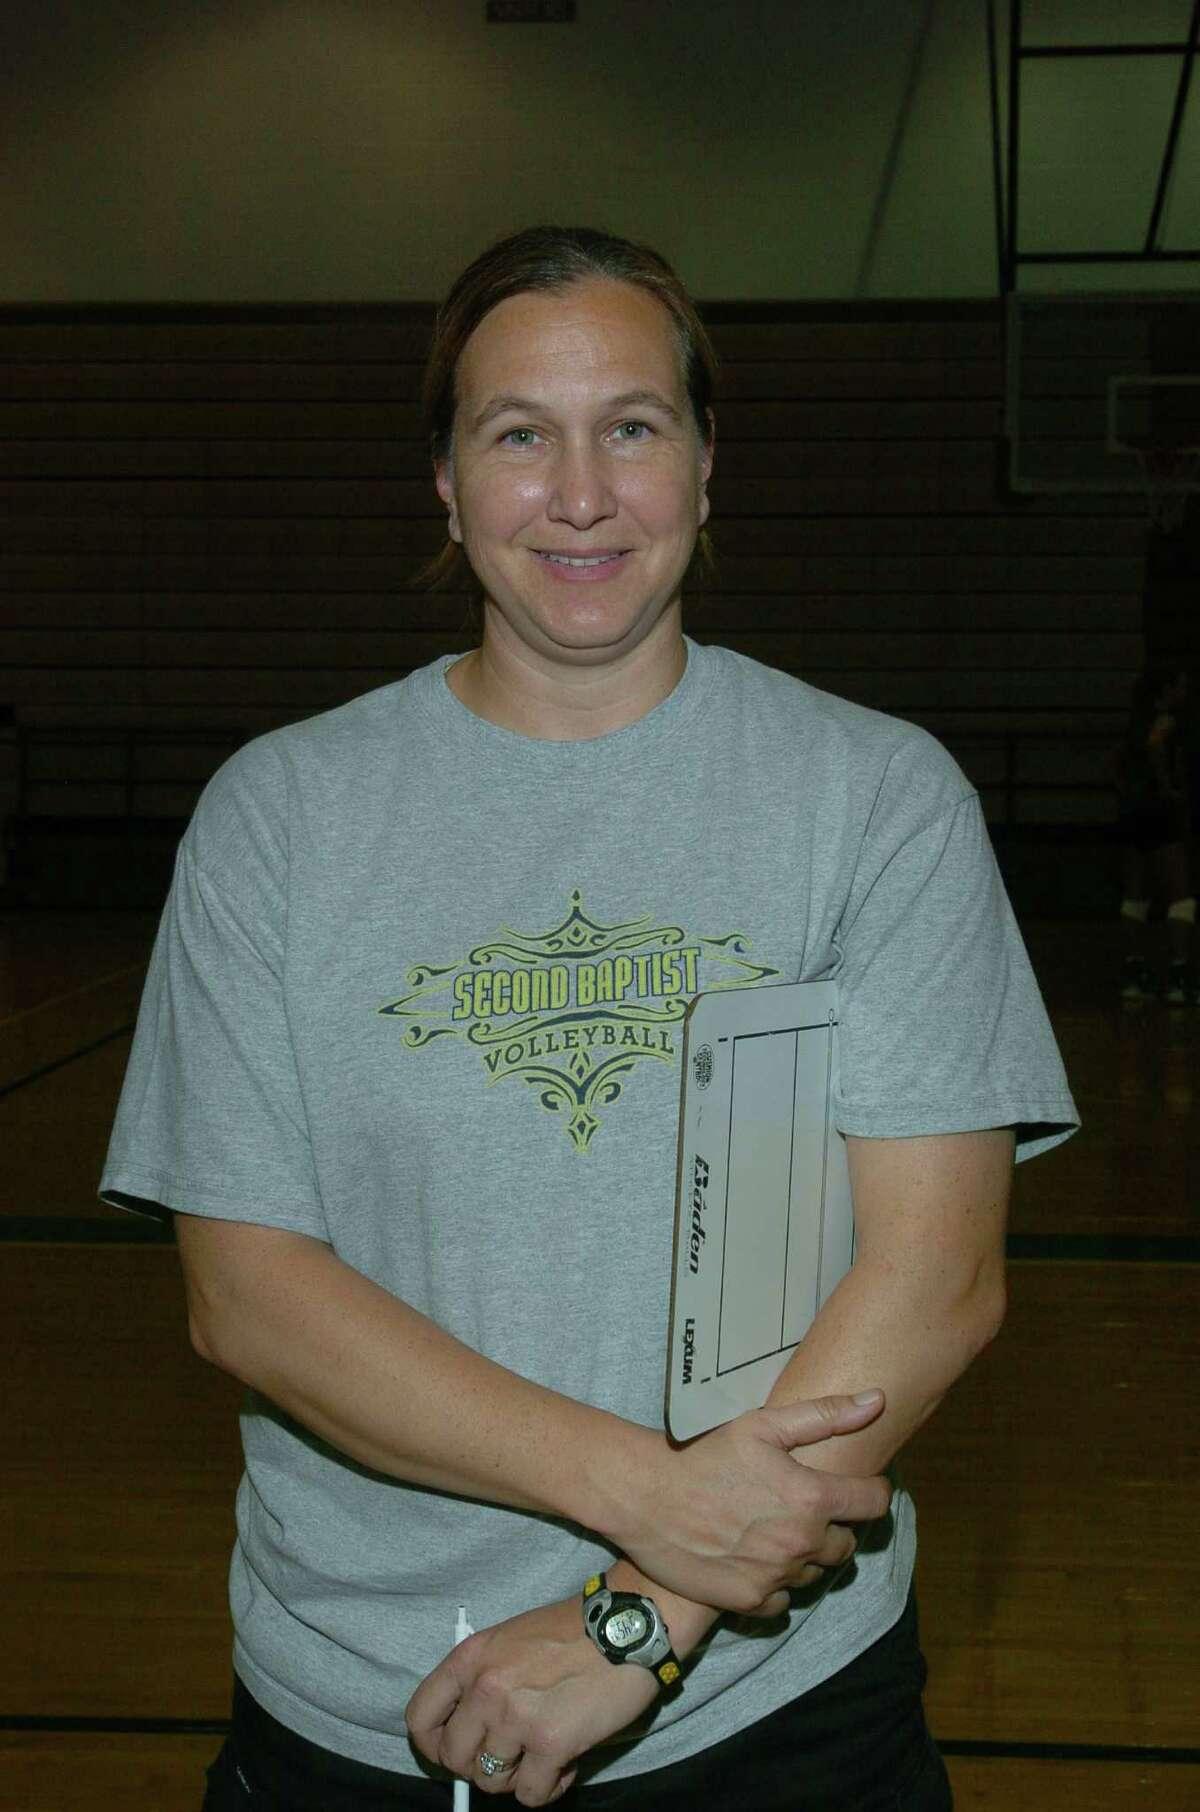 Second Baptist varsity volleyball head coach, Sue Berg. Second Baptist Volleyball team.